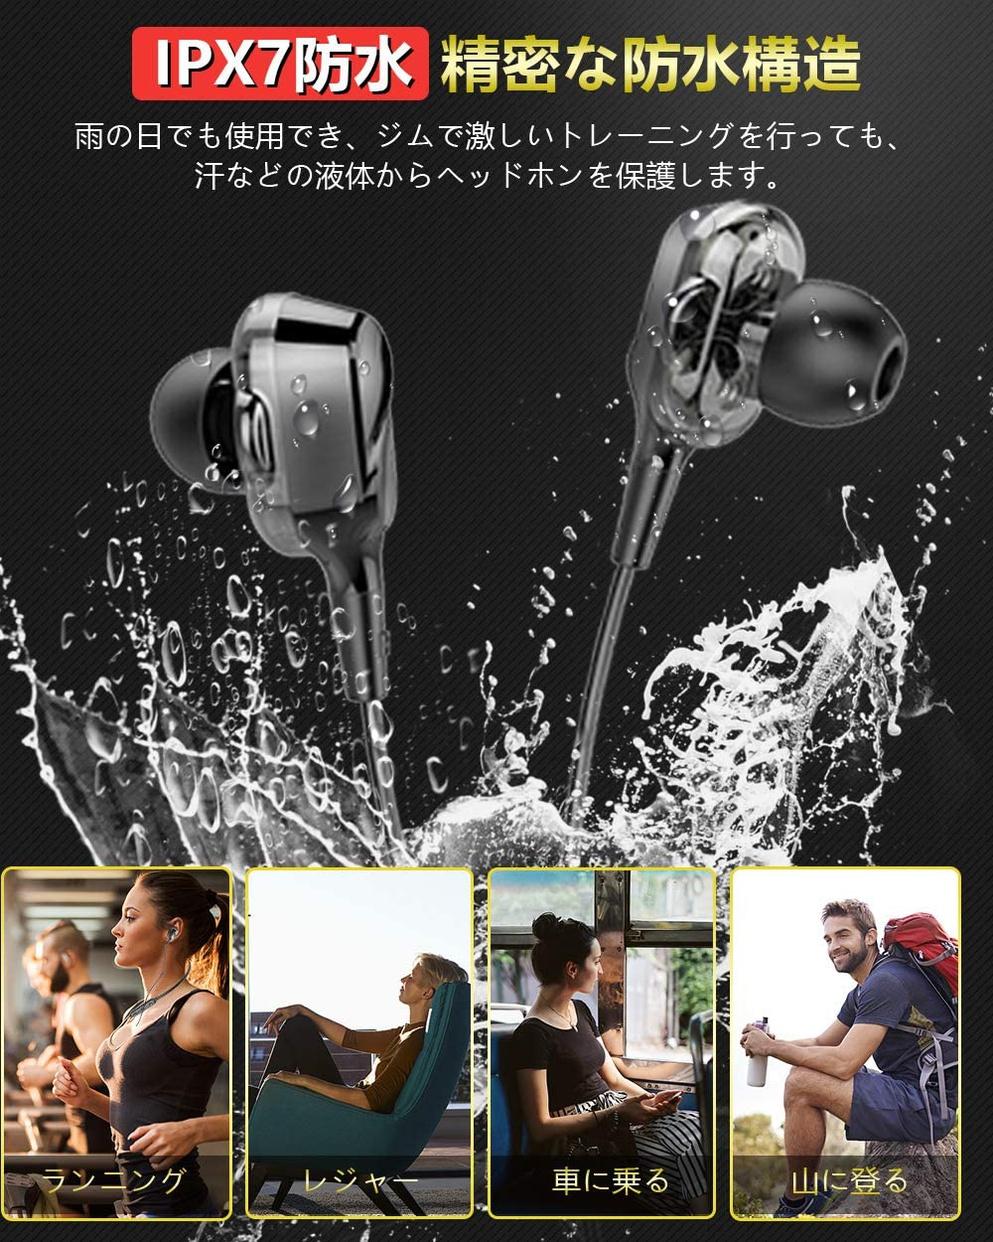 Chenlinxi(チェンリンクシ) ワイヤレス イヤホン ネックバンド型の商品画像4